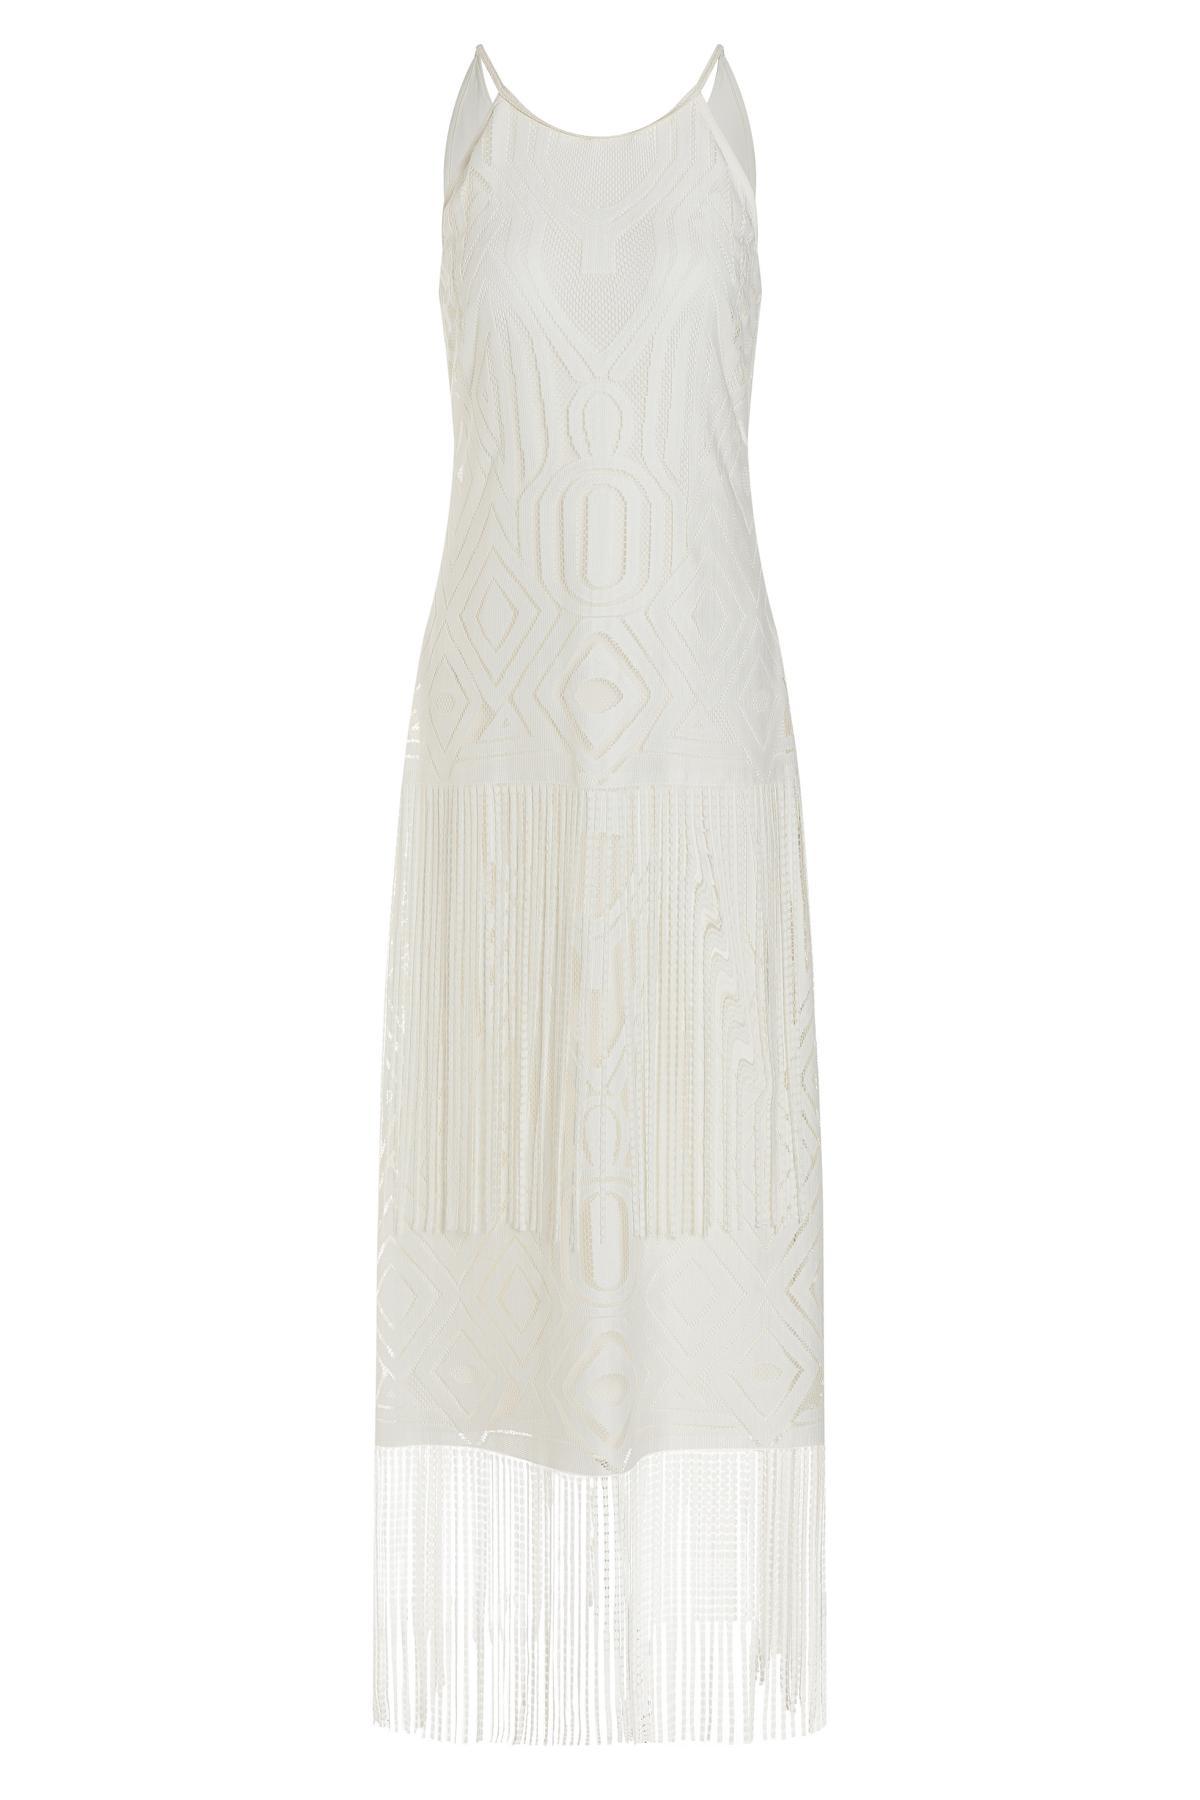 Ana Alcazar Fringe Dress Tahly